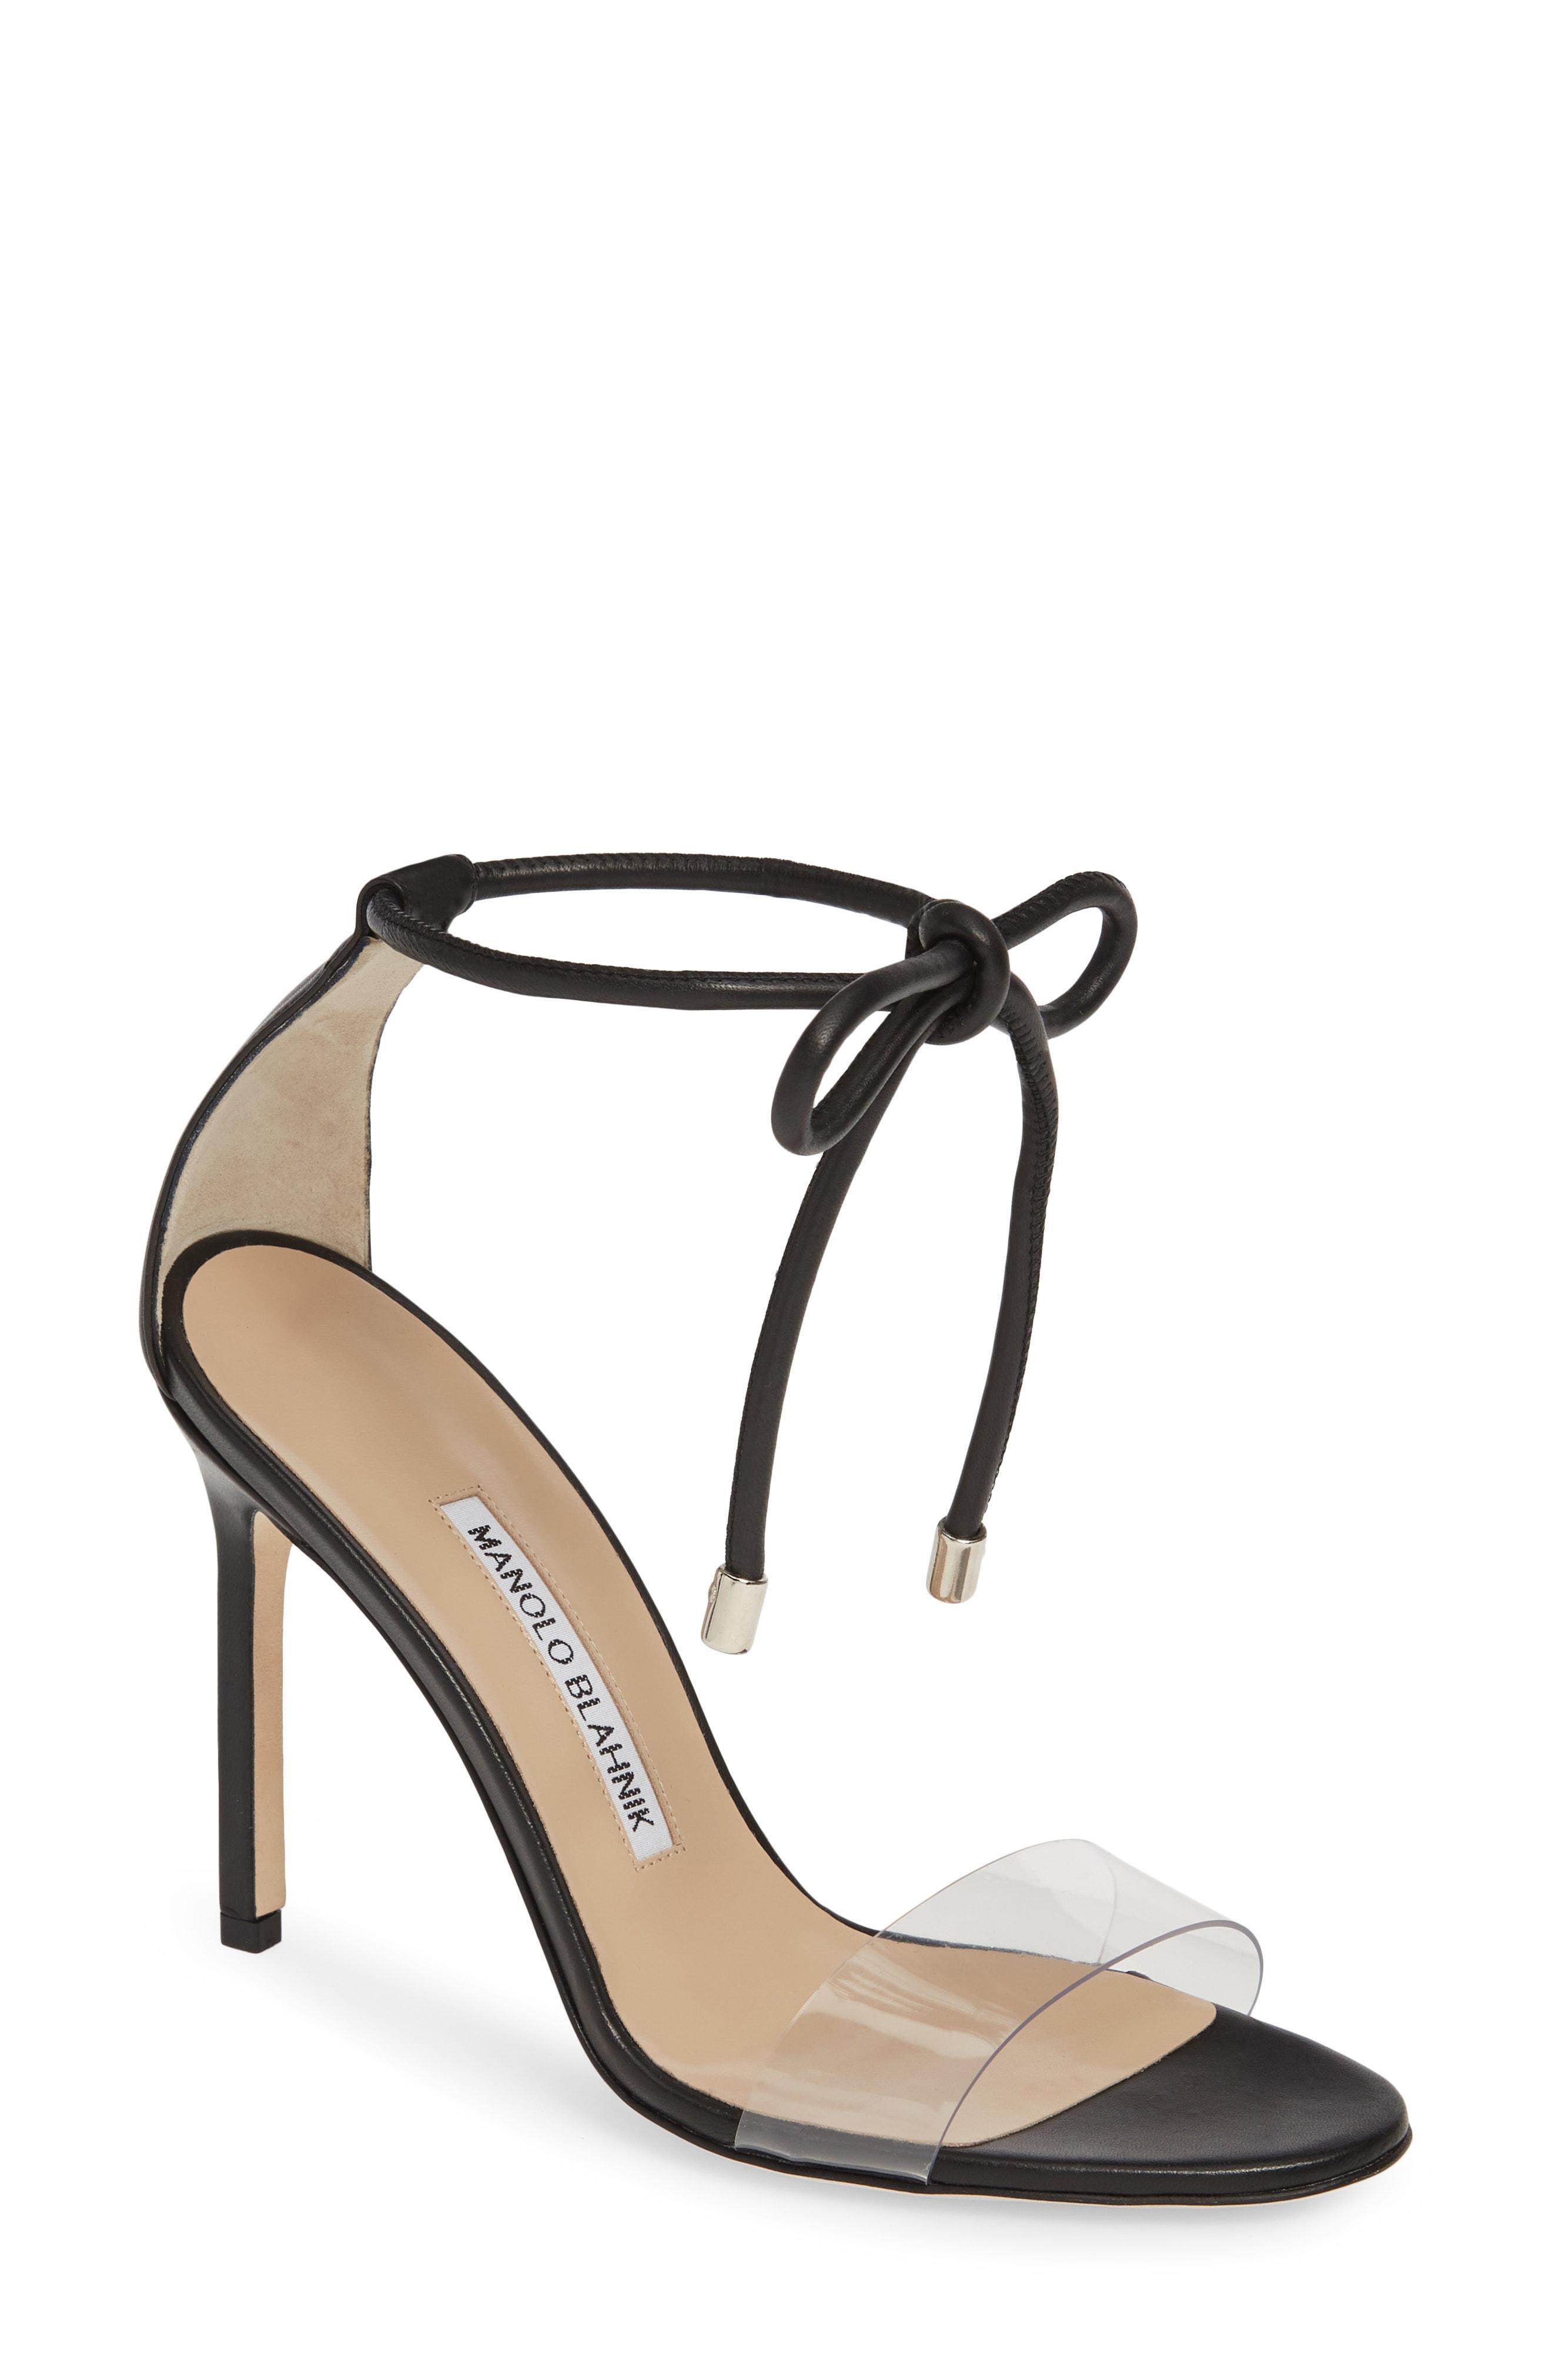 567cc9204195 Manolo Blahnik - Natural Estro Ankle Tie Sandal - Lyst. View fullscreen